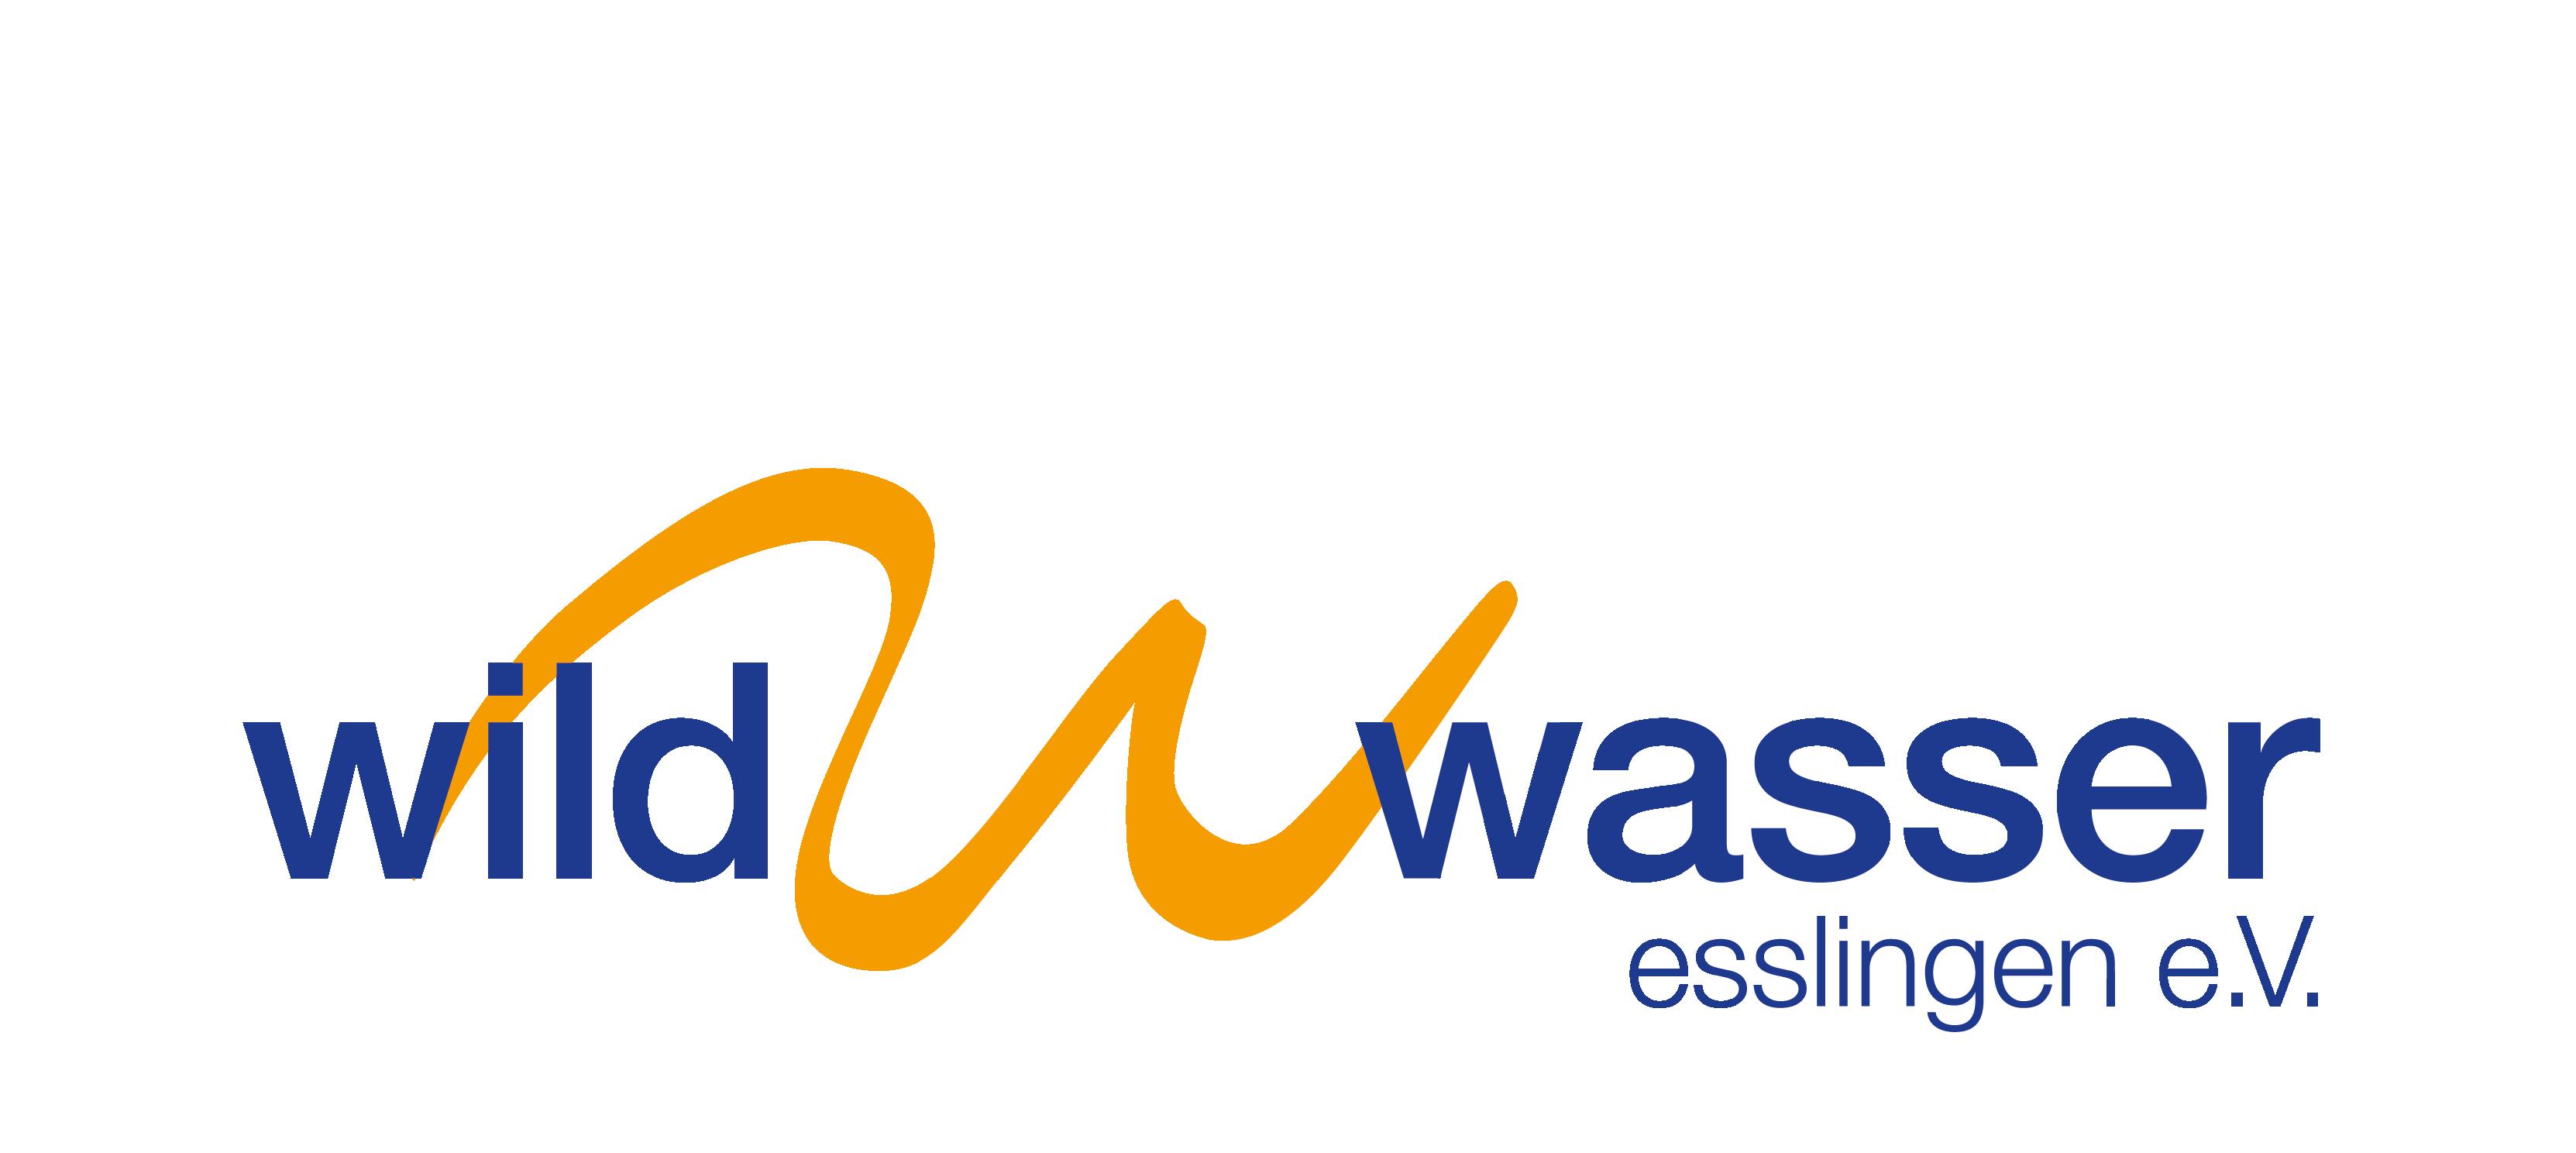 Wildwasser Logo